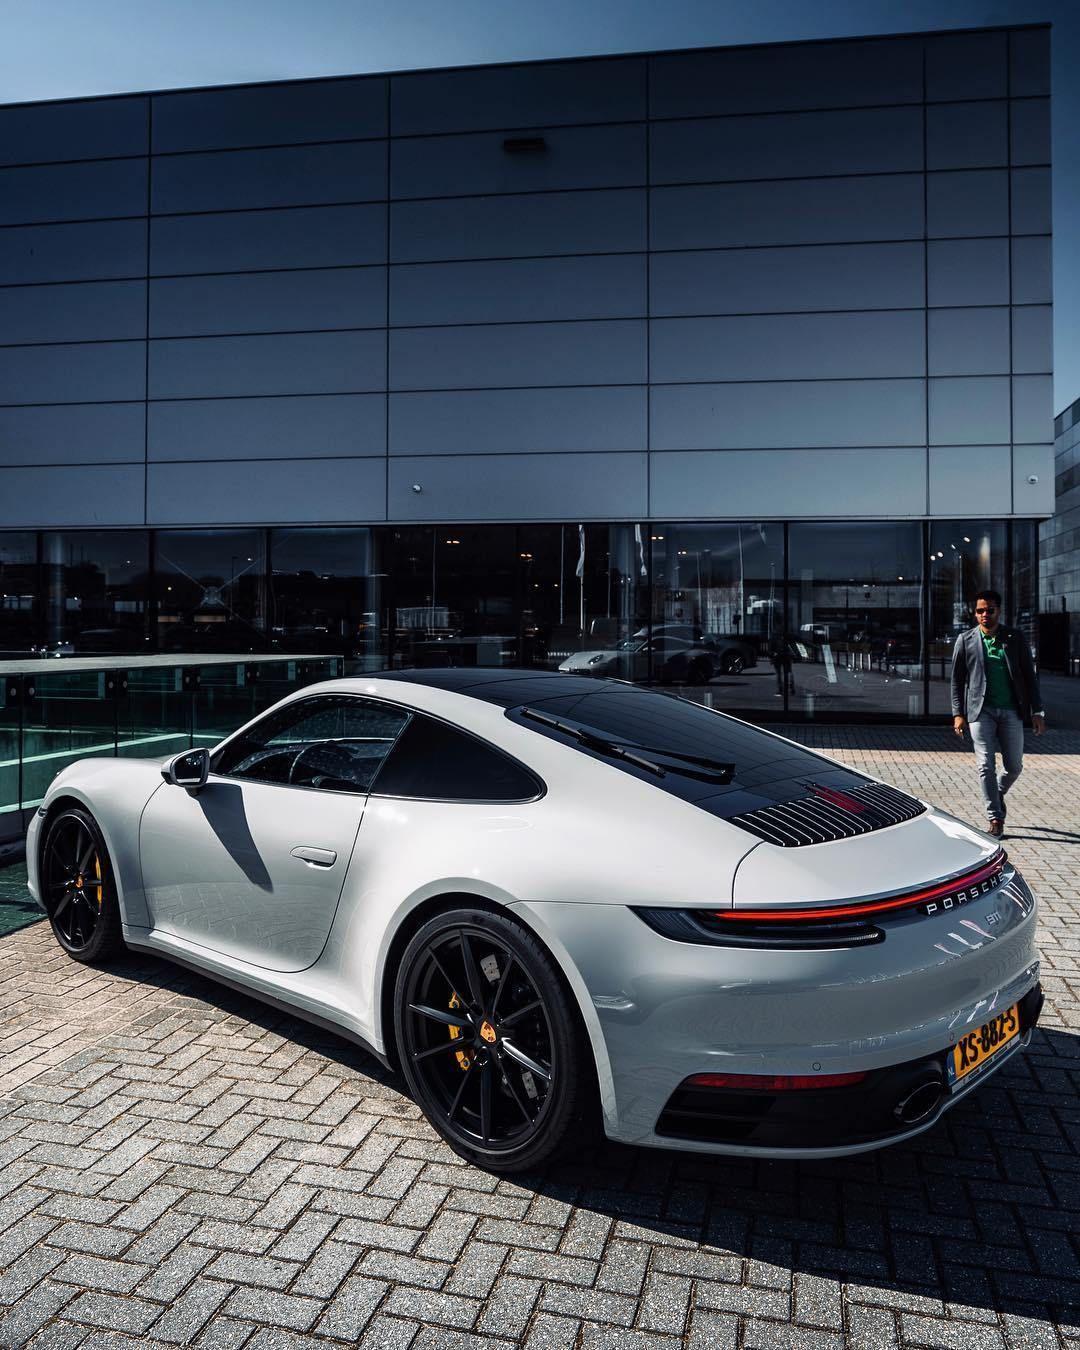 25 Inspirational Luxury Car Photo's of April 2019 · TPOInspiration.